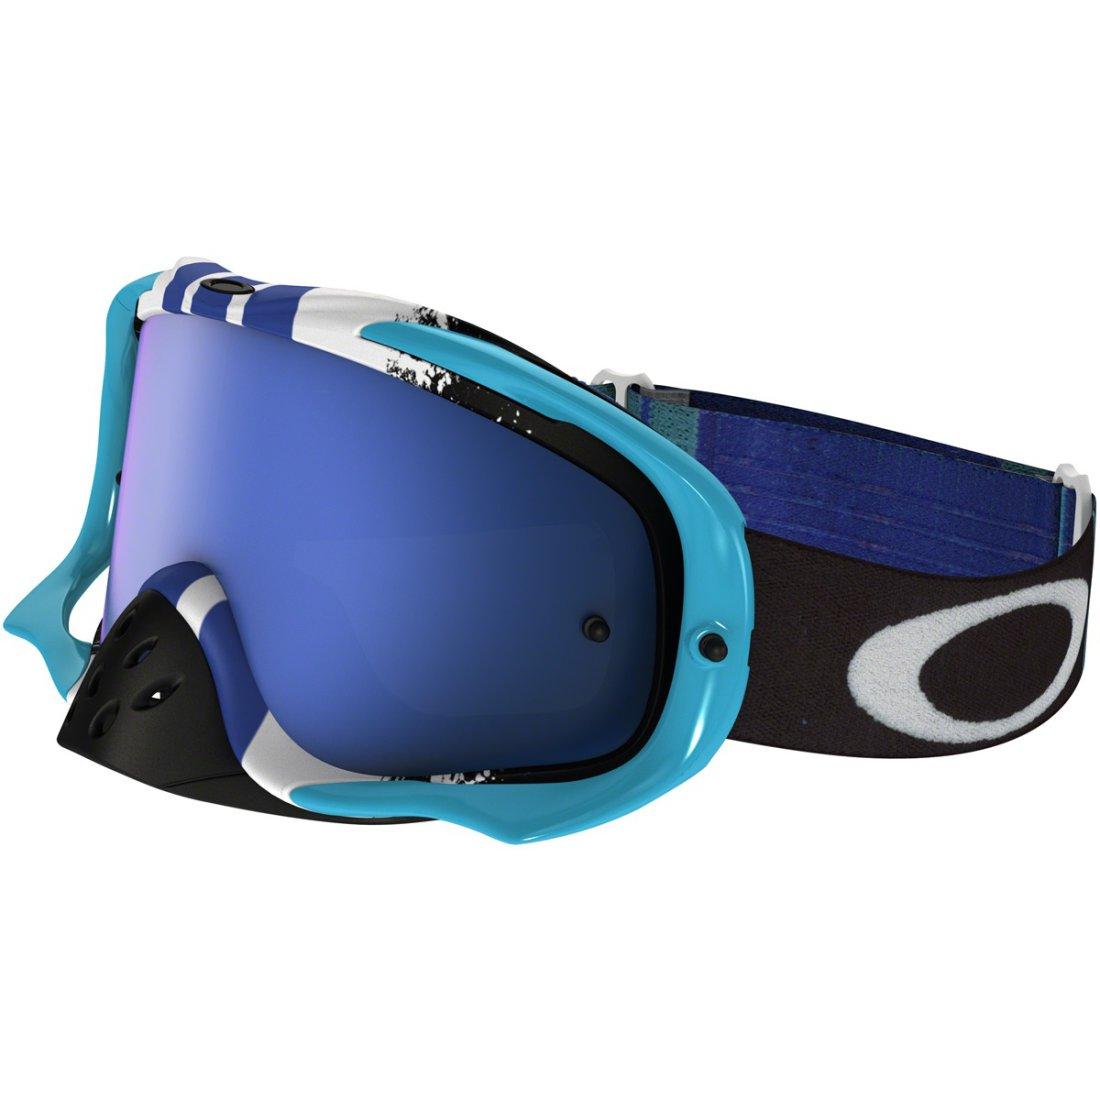 f9091adf73 OAKLEY Crowbar MX Pinned Race Blue   Black Ice Iridium Goggles · Motocard